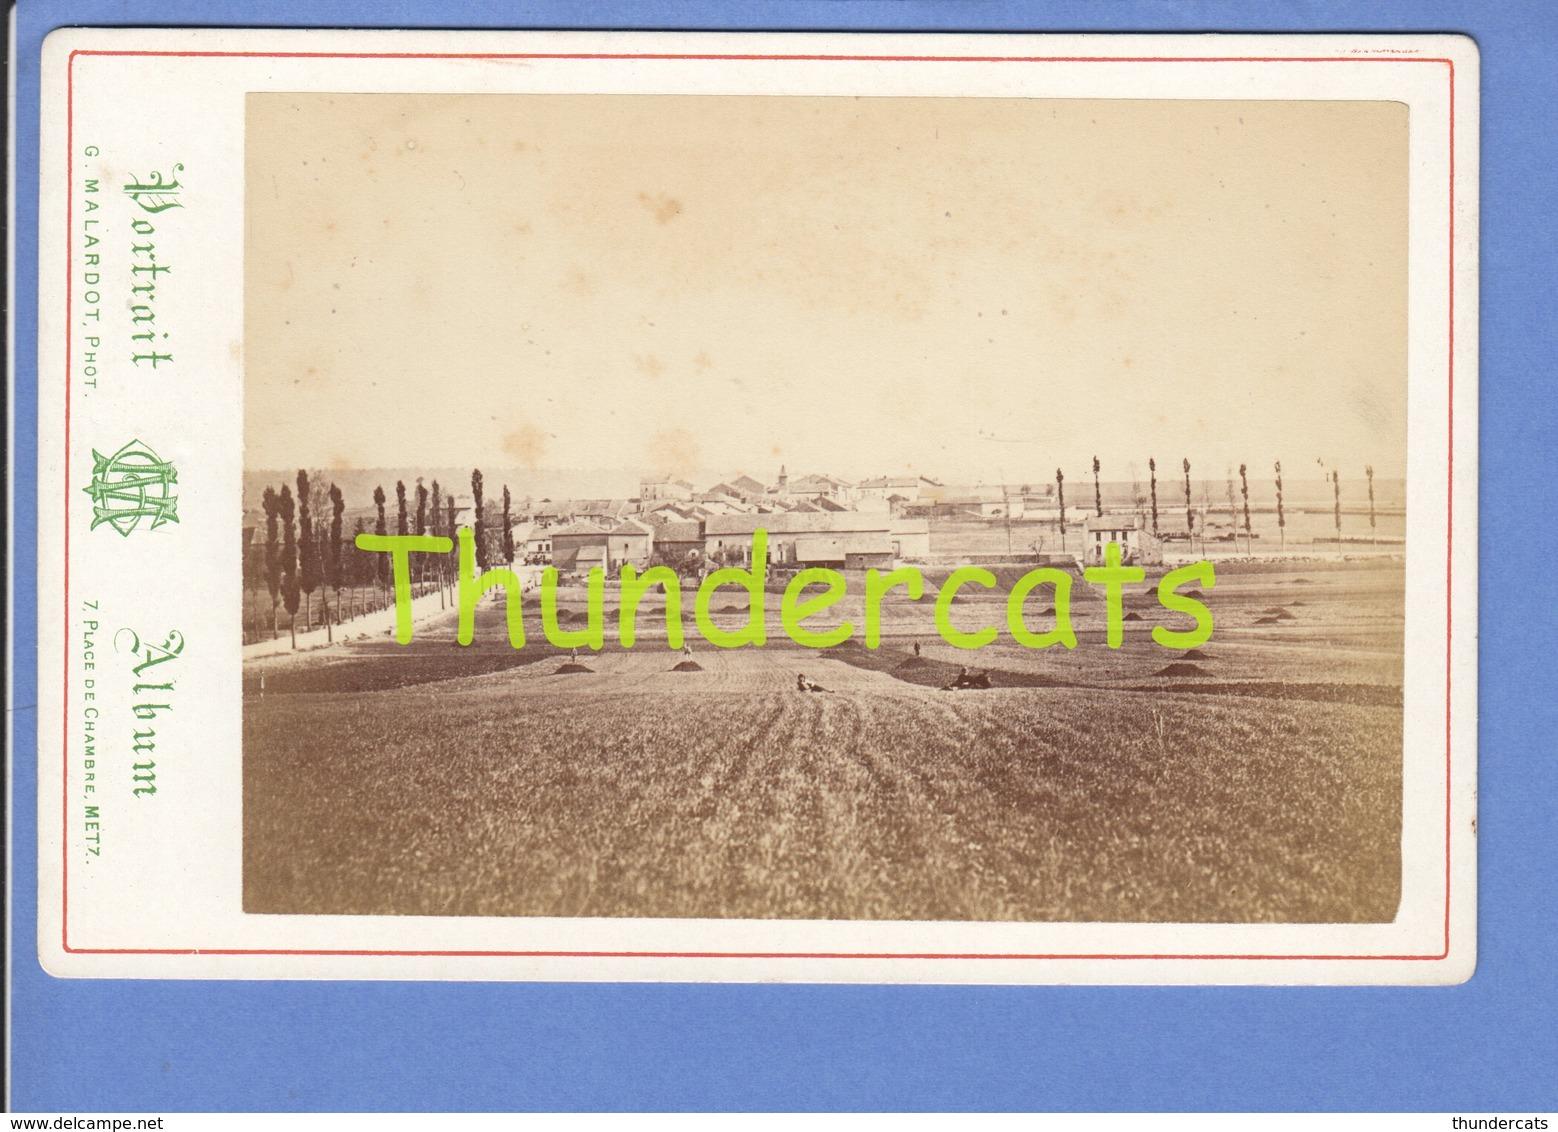 GRAND PHOTO DE CABINET 16cm X 11 Cm METZ MALARDOT GRAVELOTTE - Fotos